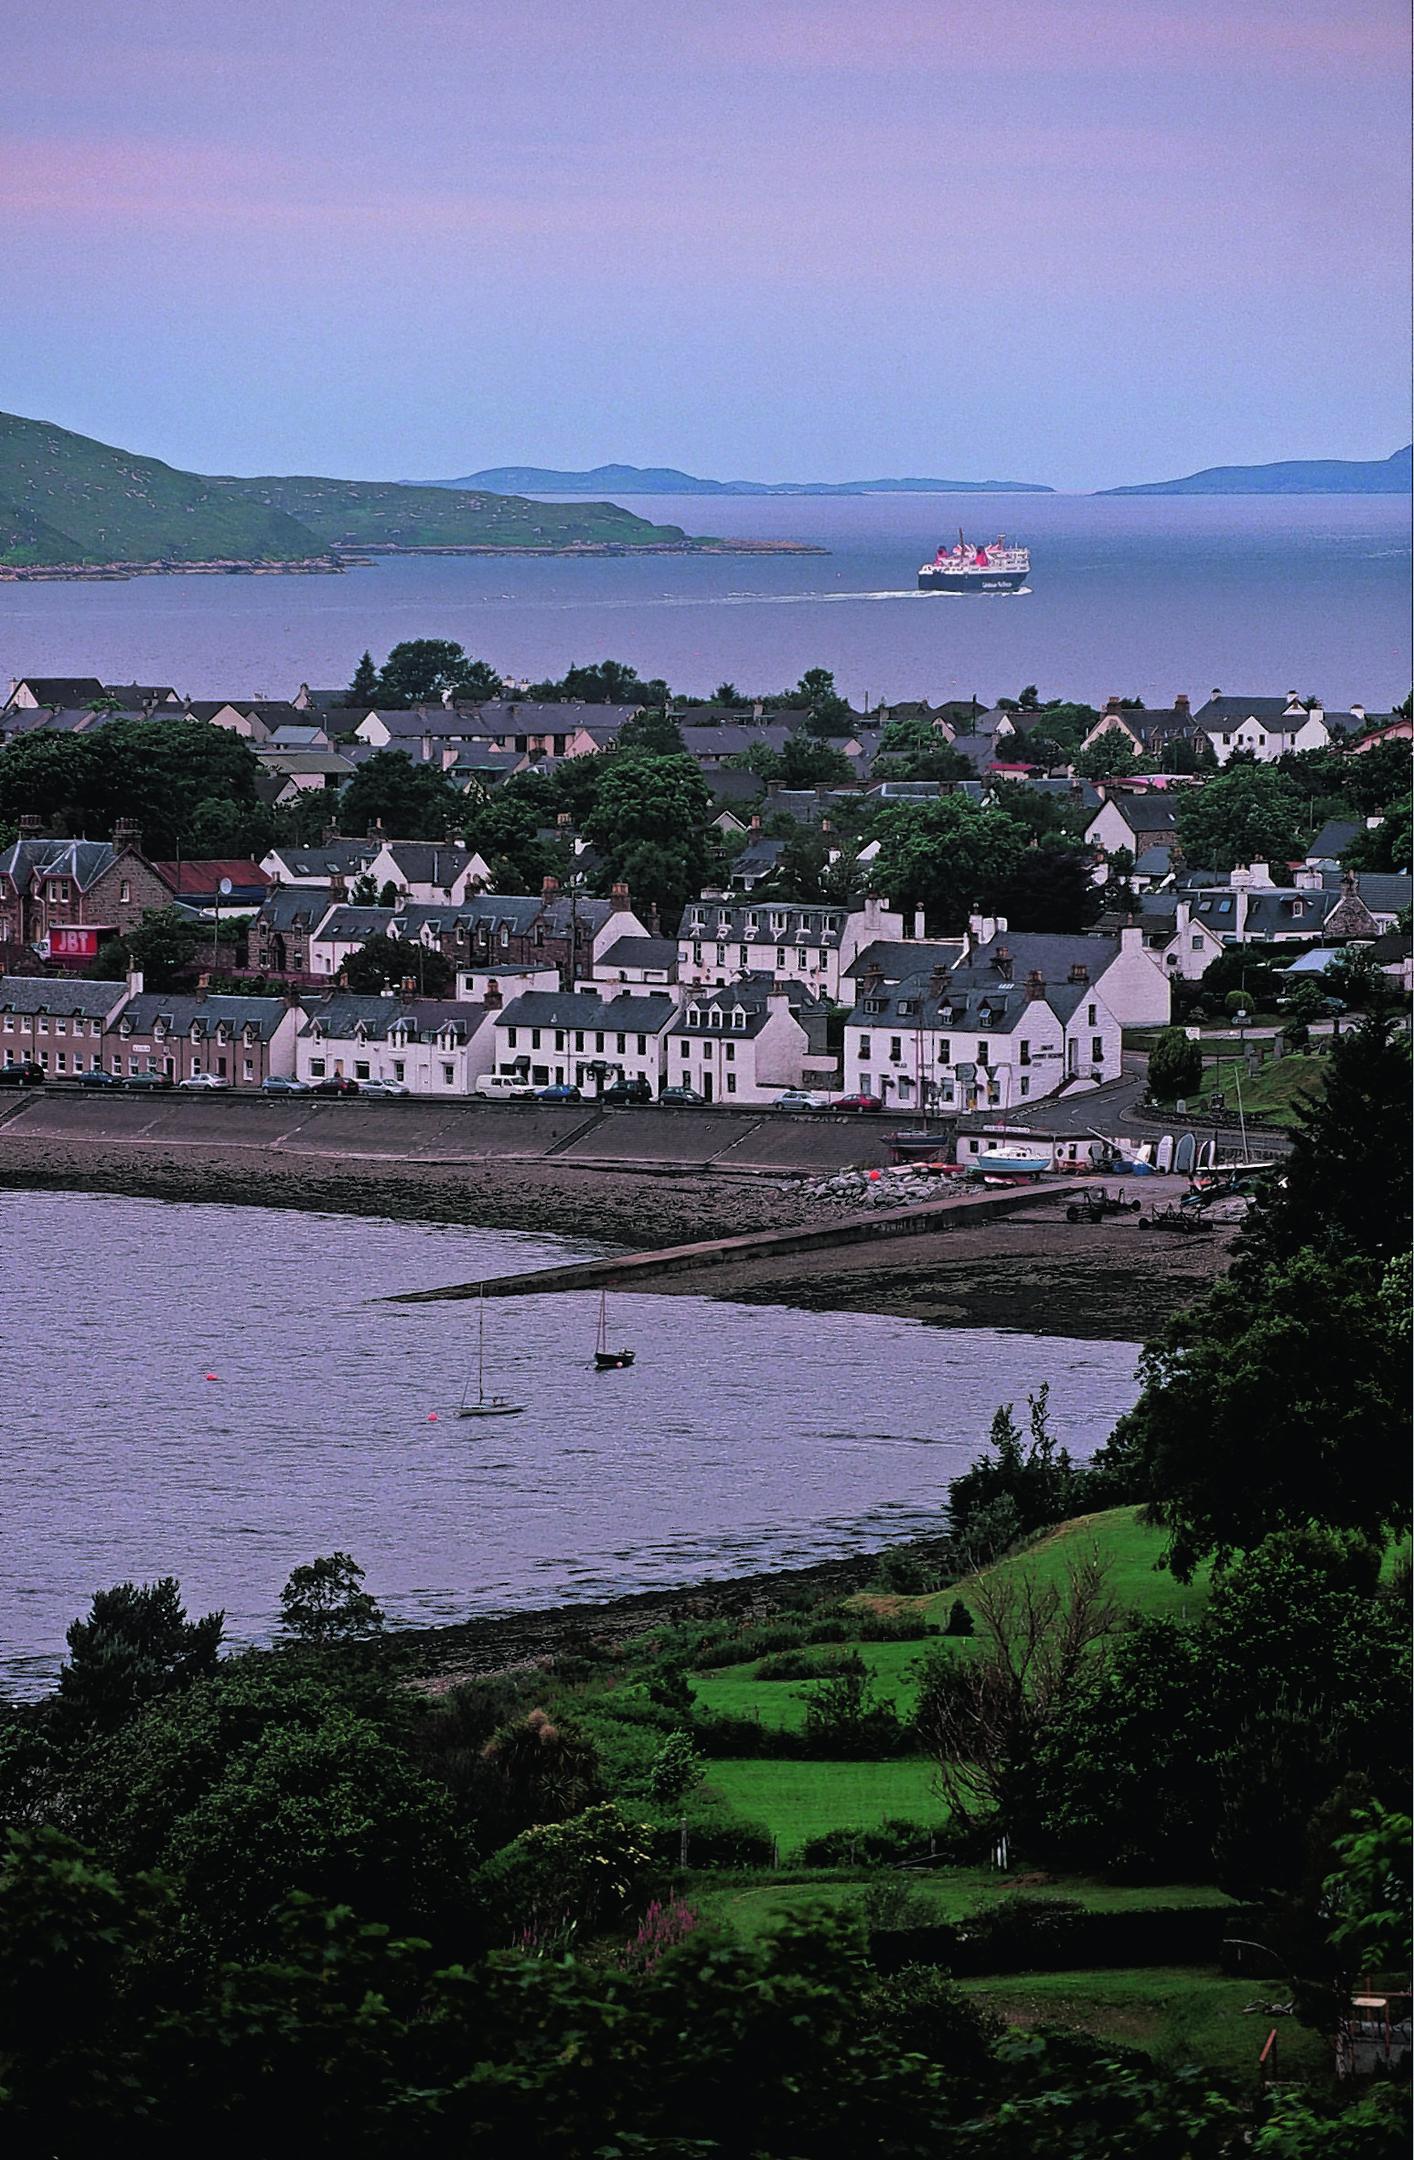 Ullapool and Loch Broom